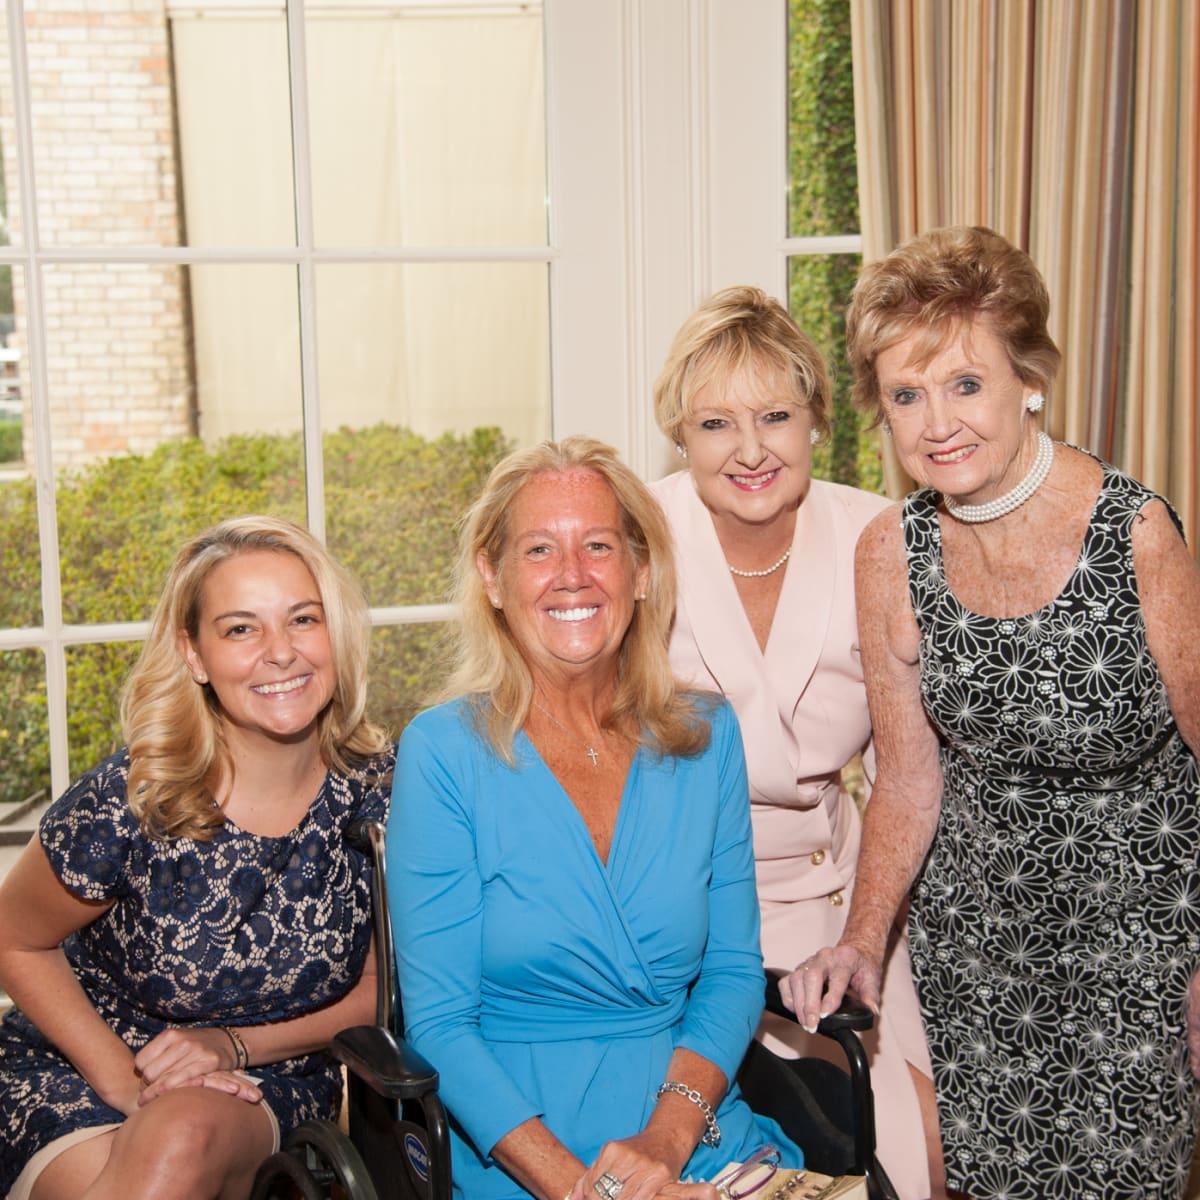 News, shelby, Foundation for Teen Health luncheon, Oct. 2015, Annie Beck, Nancy Beck Deane, Debbie Beck, Rose Beck